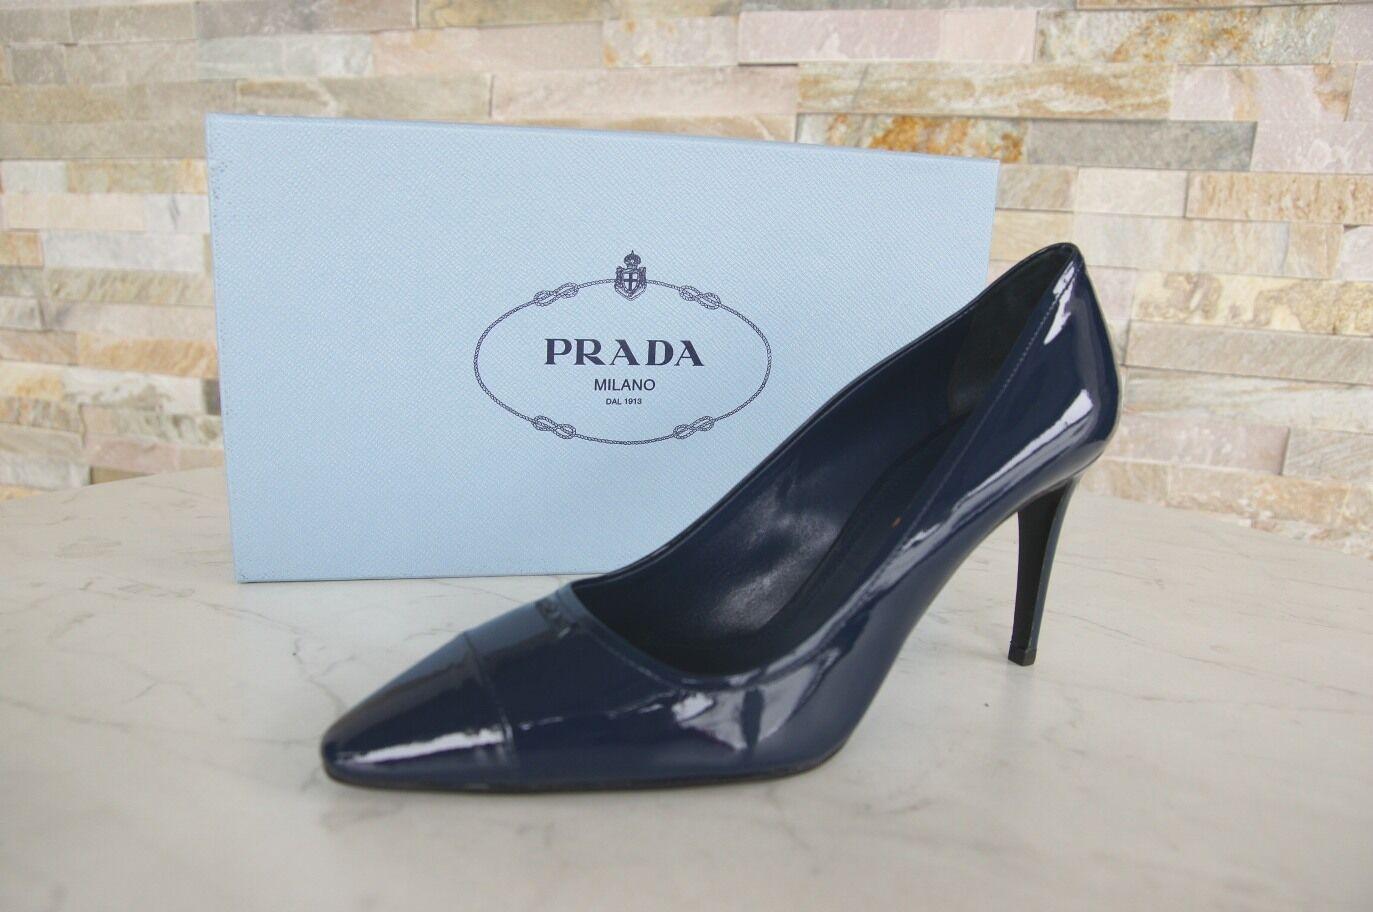 PRADA  Dimensione 40,5 Pumps Heels Patent scarpe 1i69f blu NUOVO  solo per te